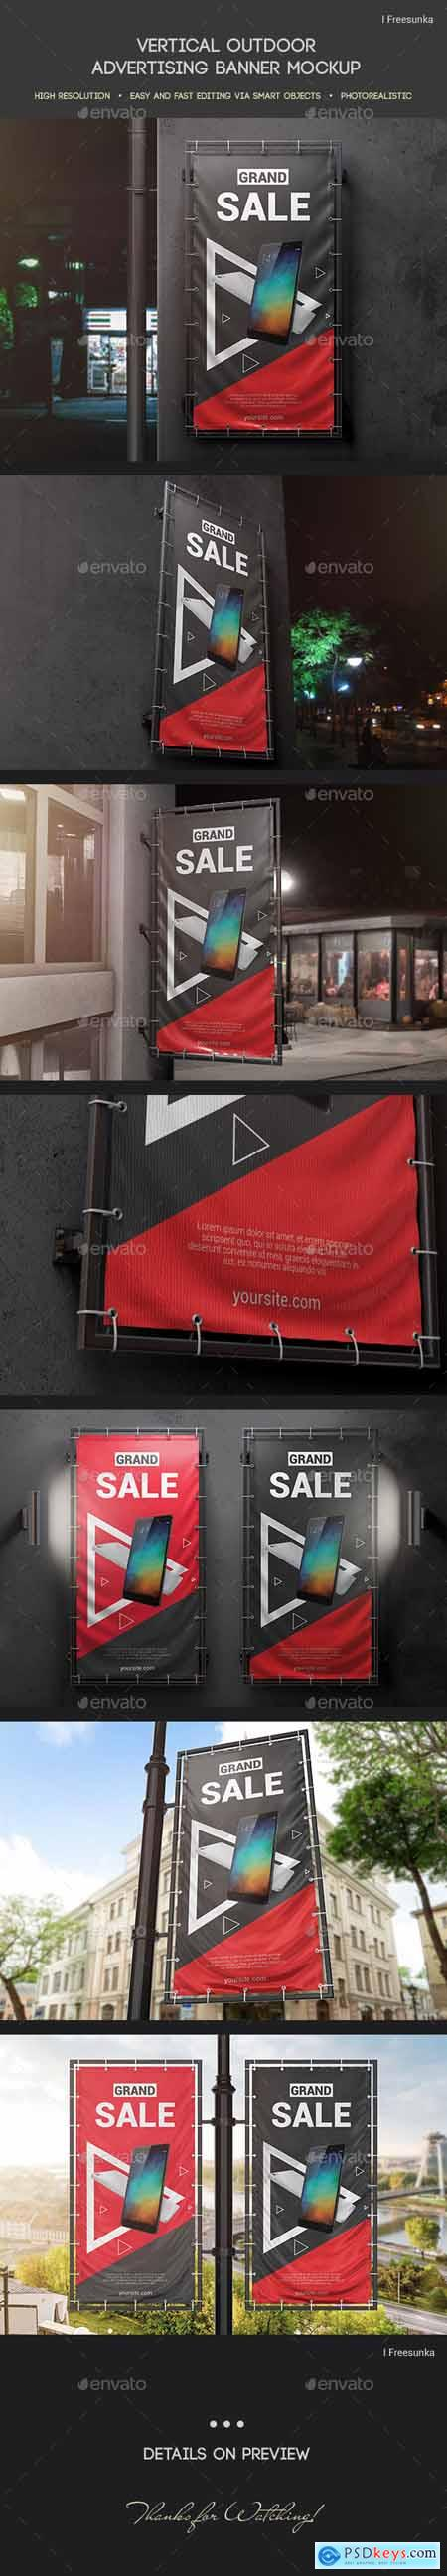 Vertical Outdoor Advertising Banner Mockup 24844153